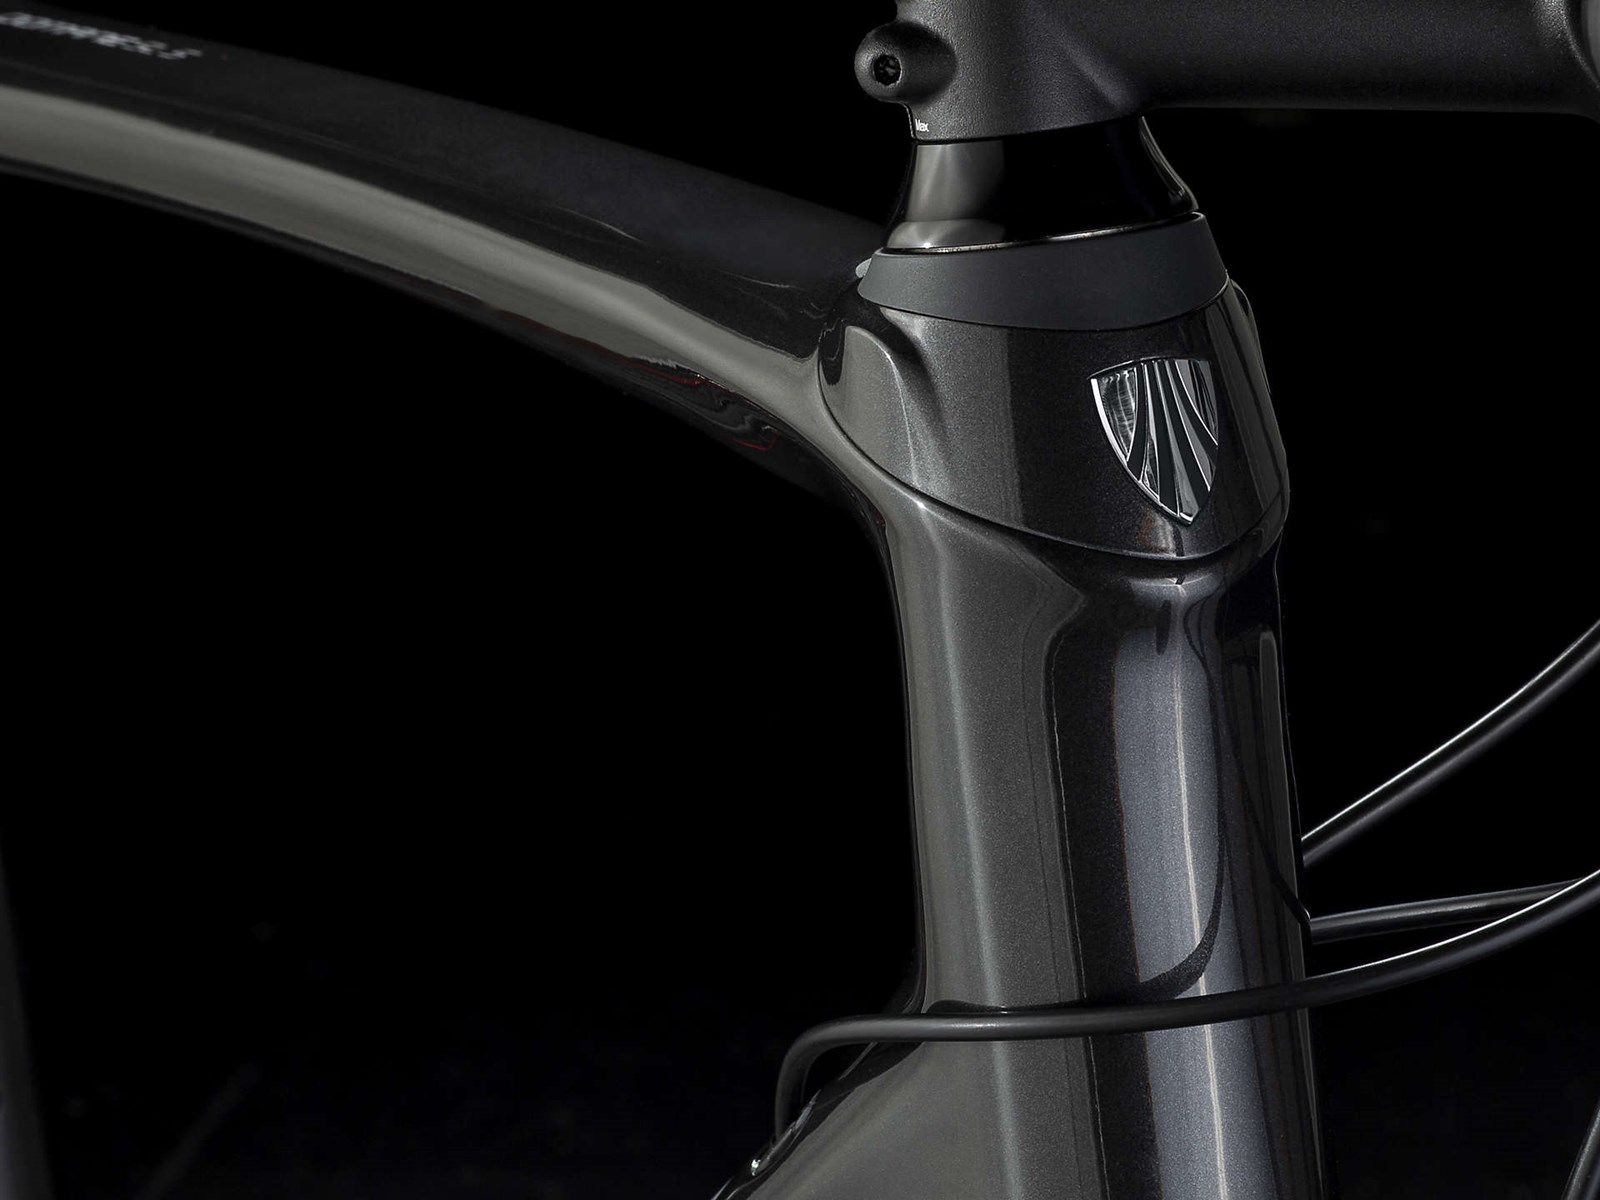 Trek Domane SL 5 Disc Mens Carbon Road Bike 2019 - Black/Red